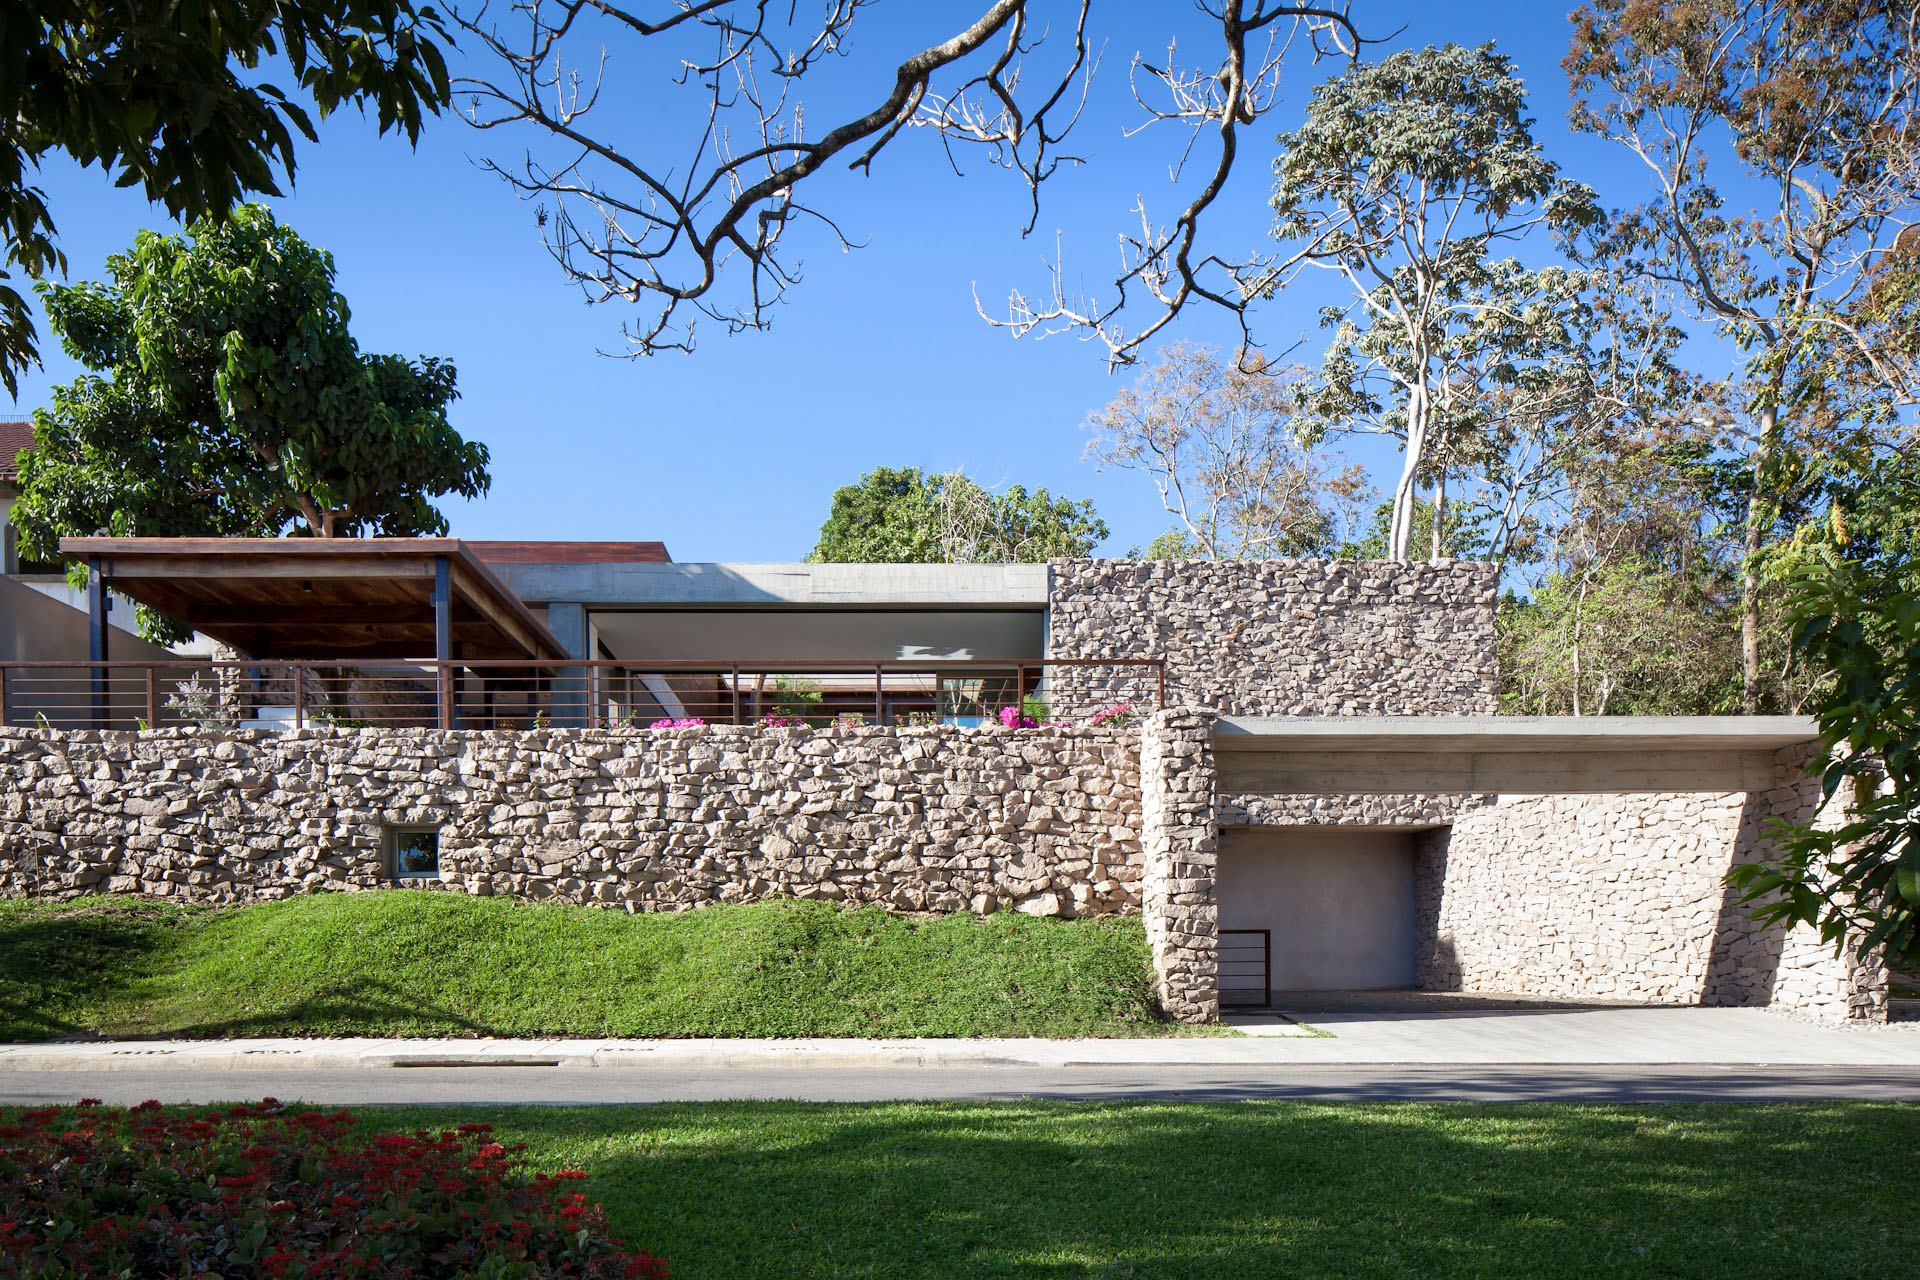 Architecture-Modern-Casa-Jardin-El-Salvador-Jason-Bax-01.JPG